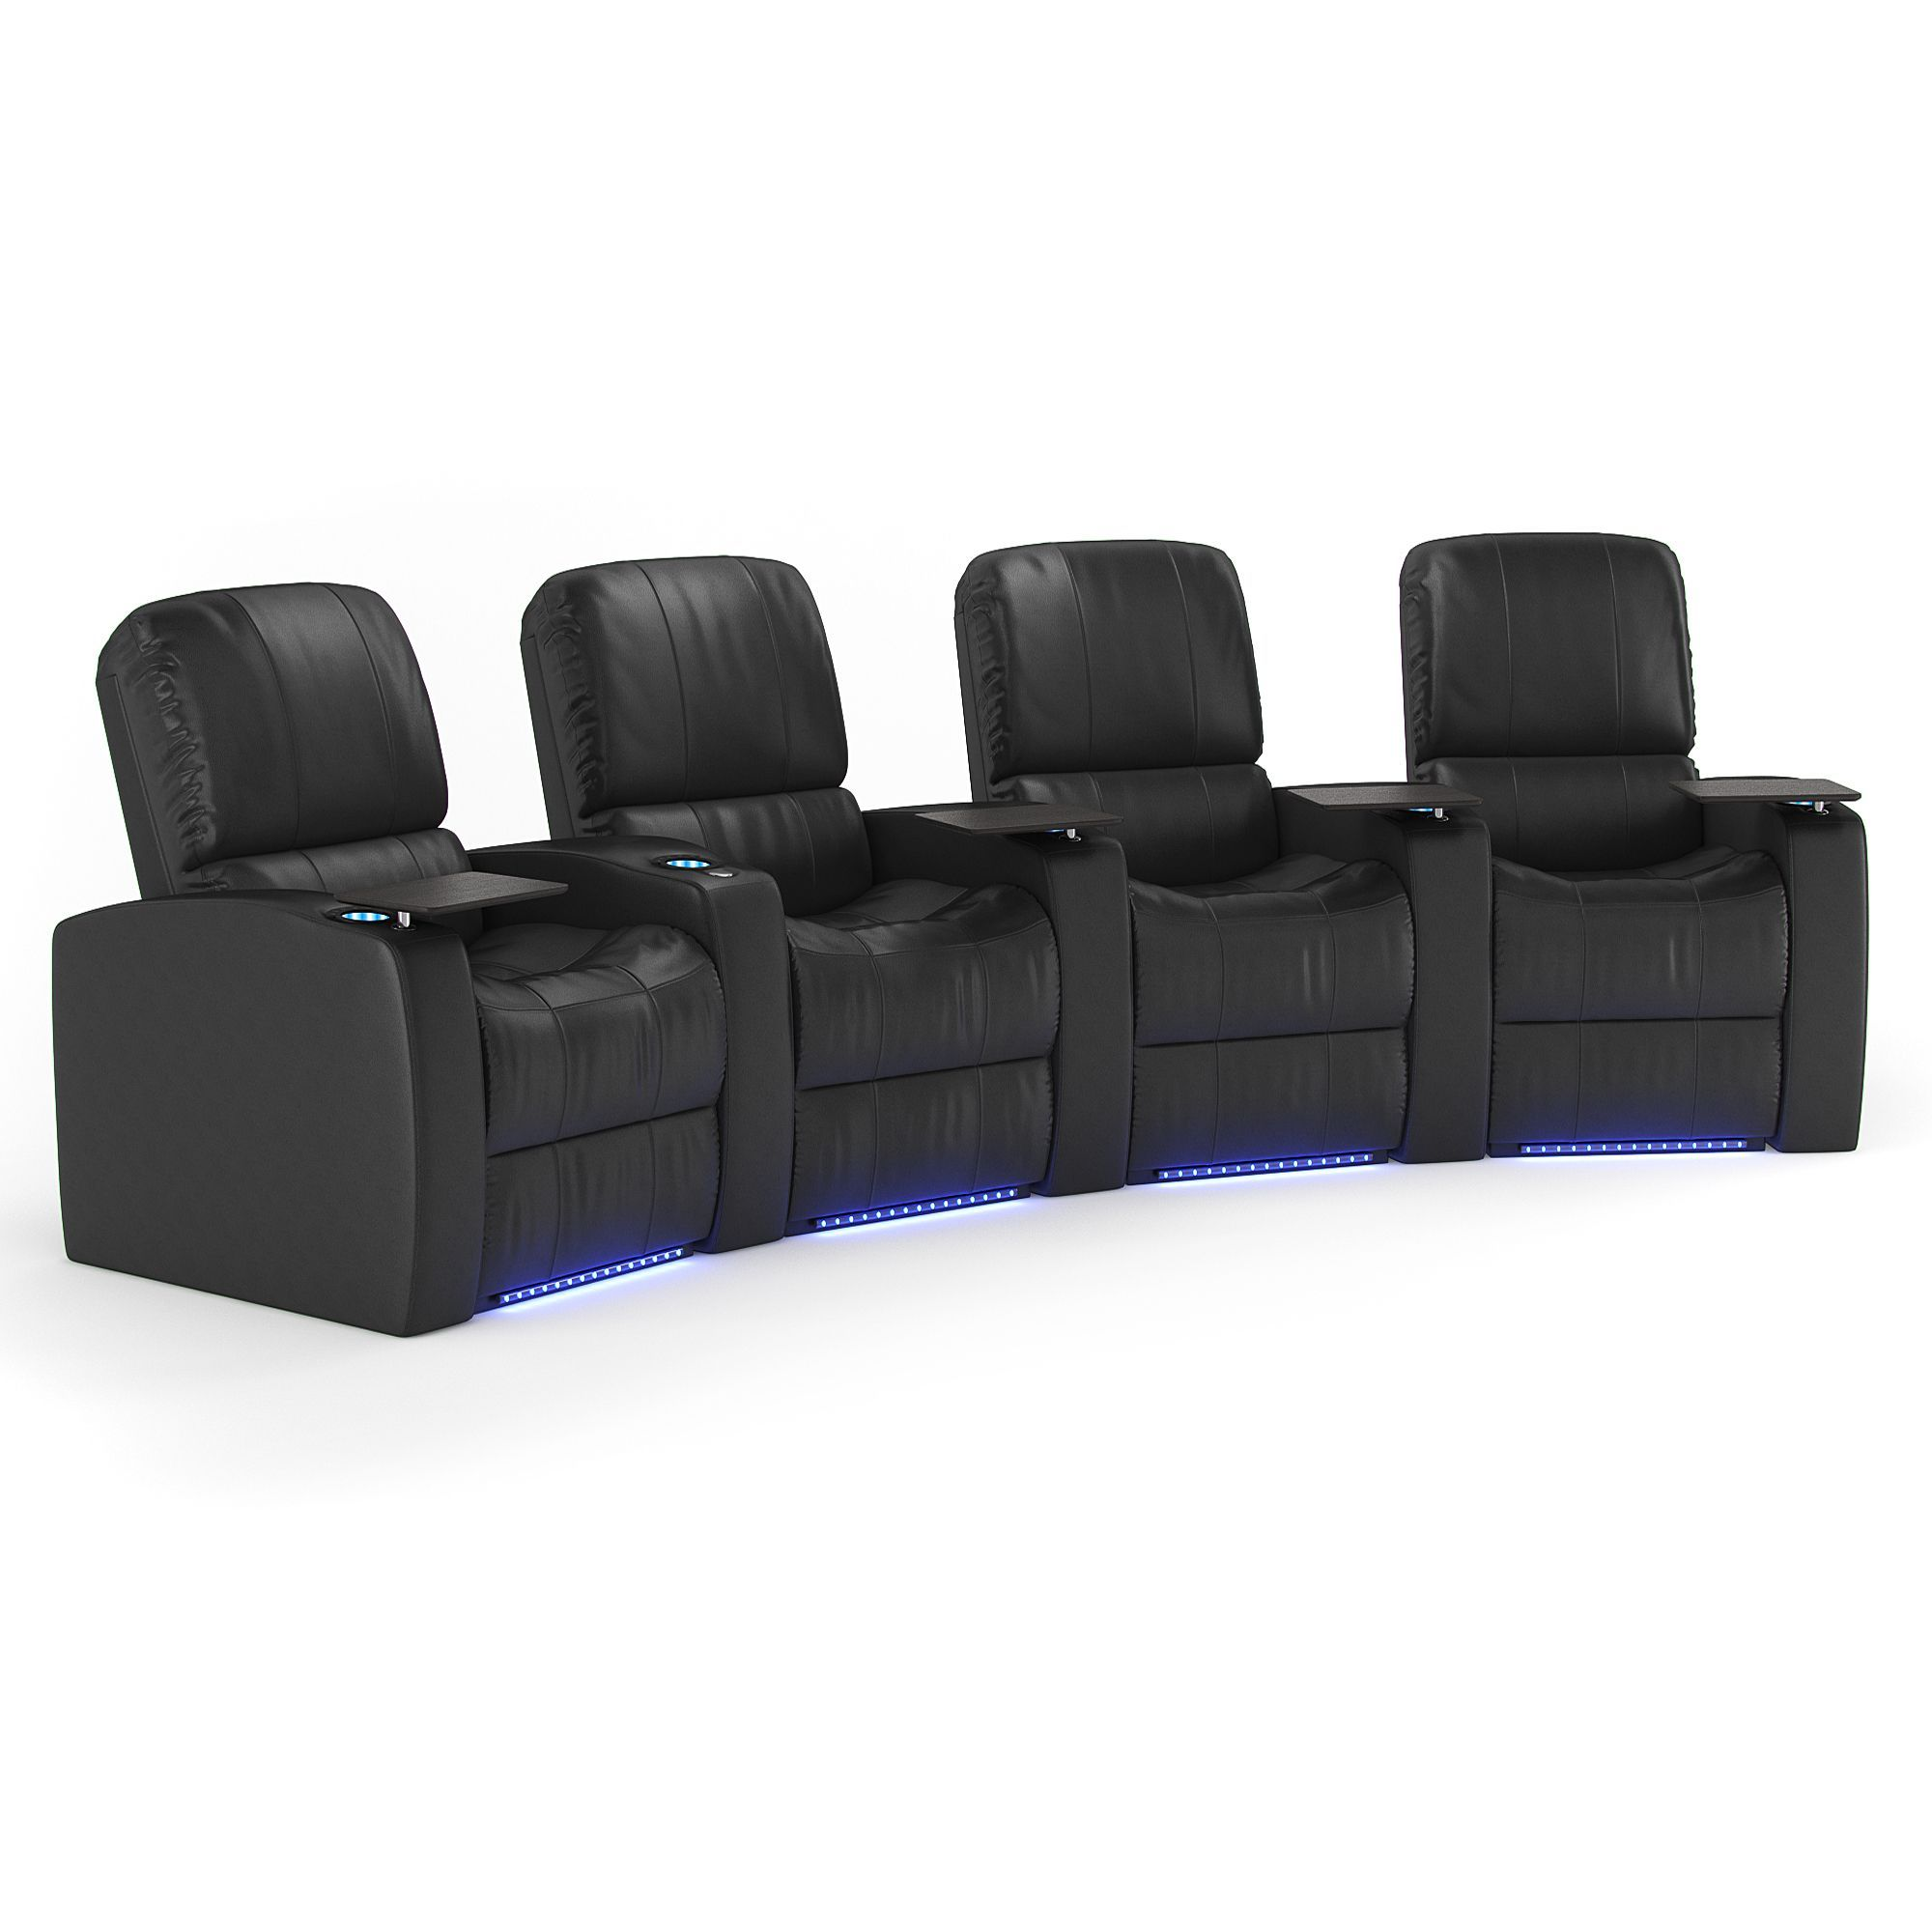 Octane Blaze XL900 Seats Curved/ Power Recline/ Black Premium ...